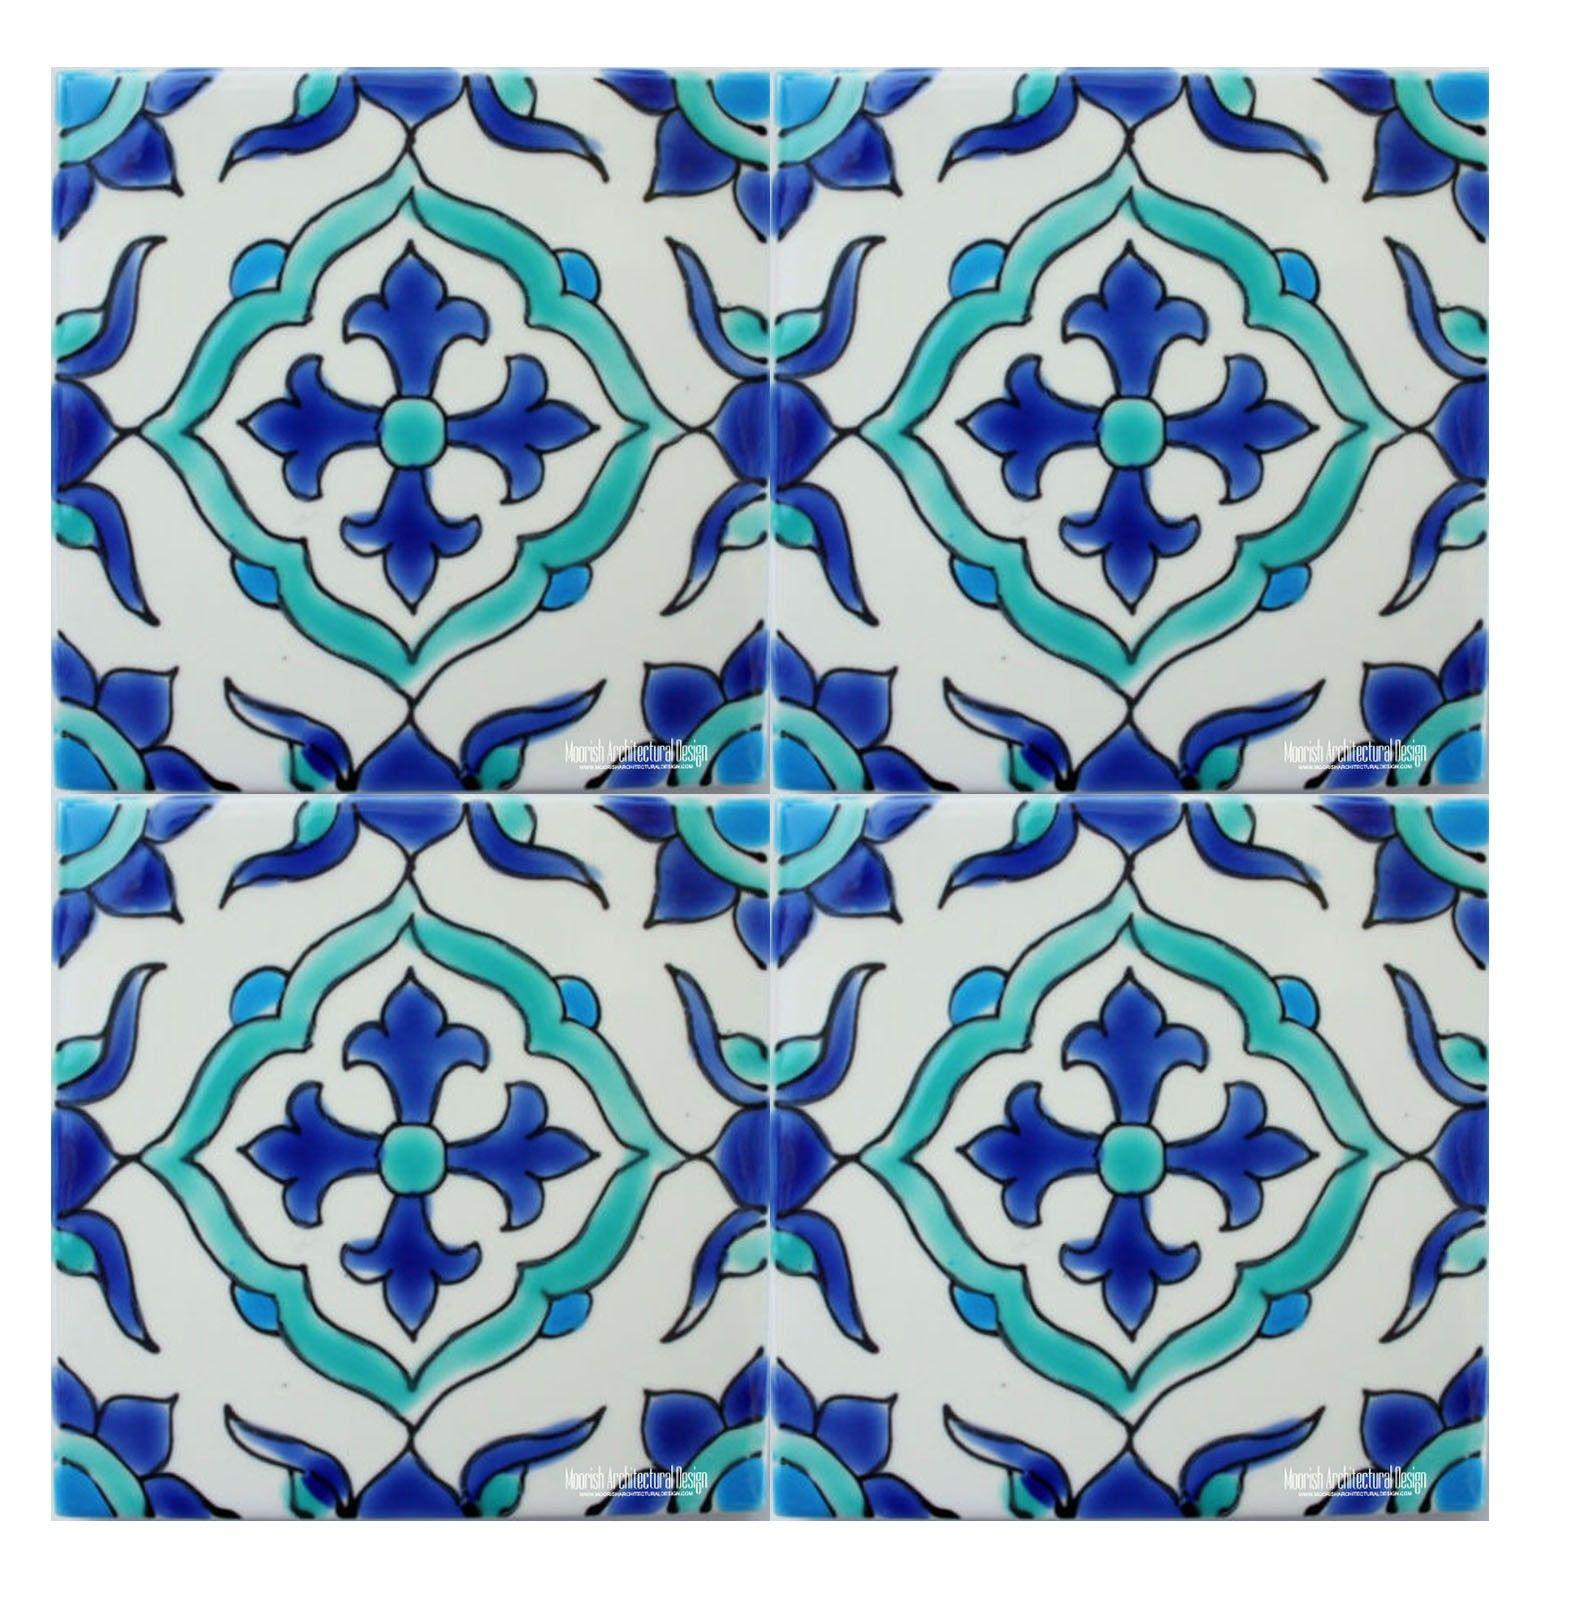 Pin von Tari Olds auf Pool tile | Pinterest